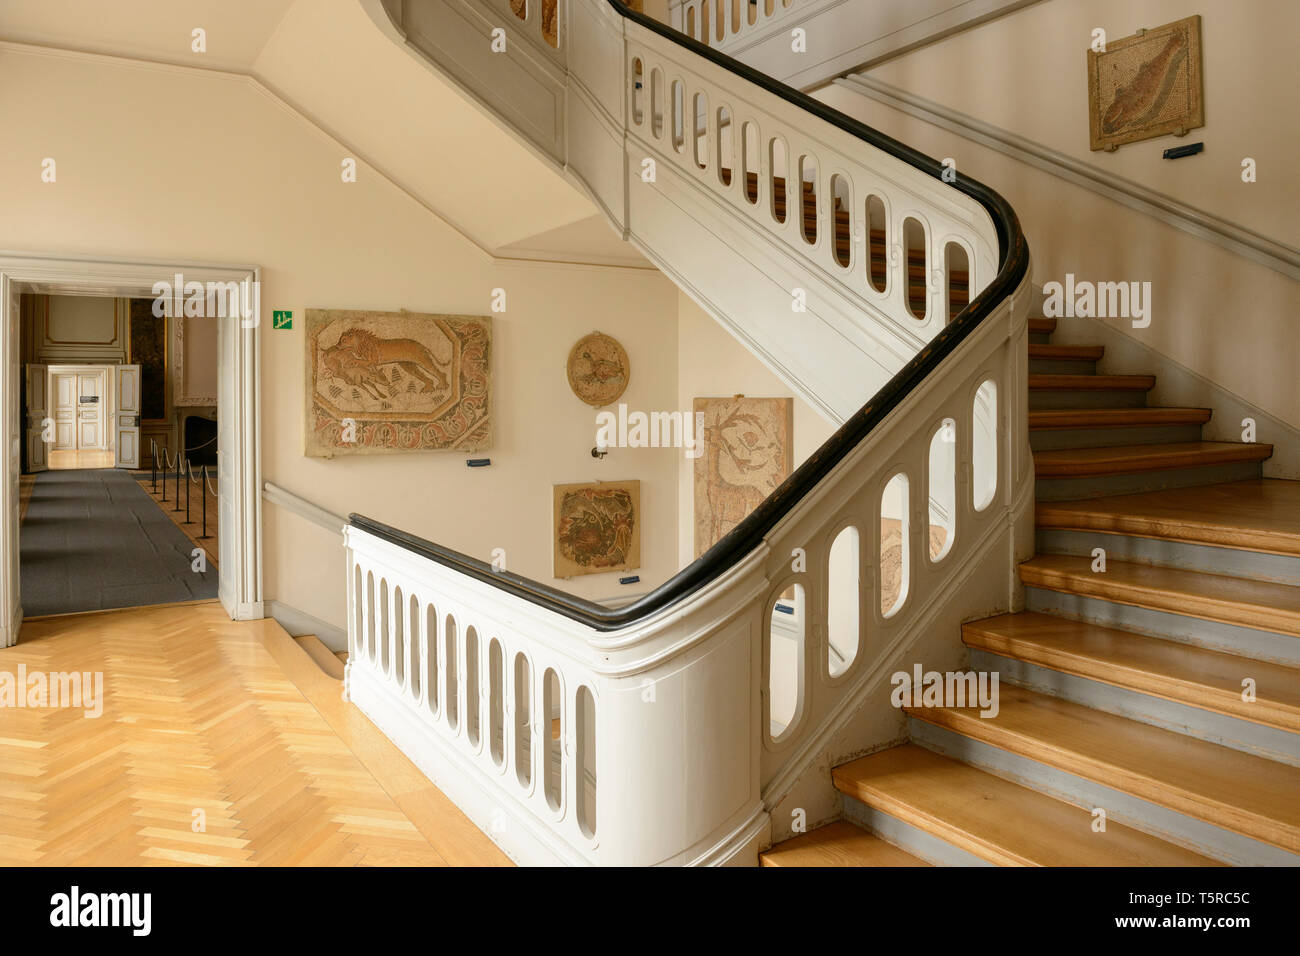 Una escalera de madera en el Museo Nacional de Copenhague, Dinamarca. Foto de stock